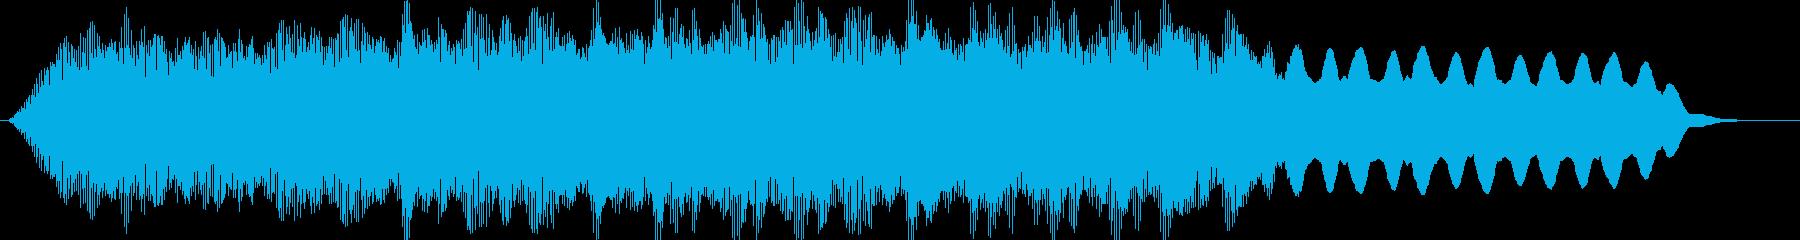 PADS 雄大な日01の再生済みの波形